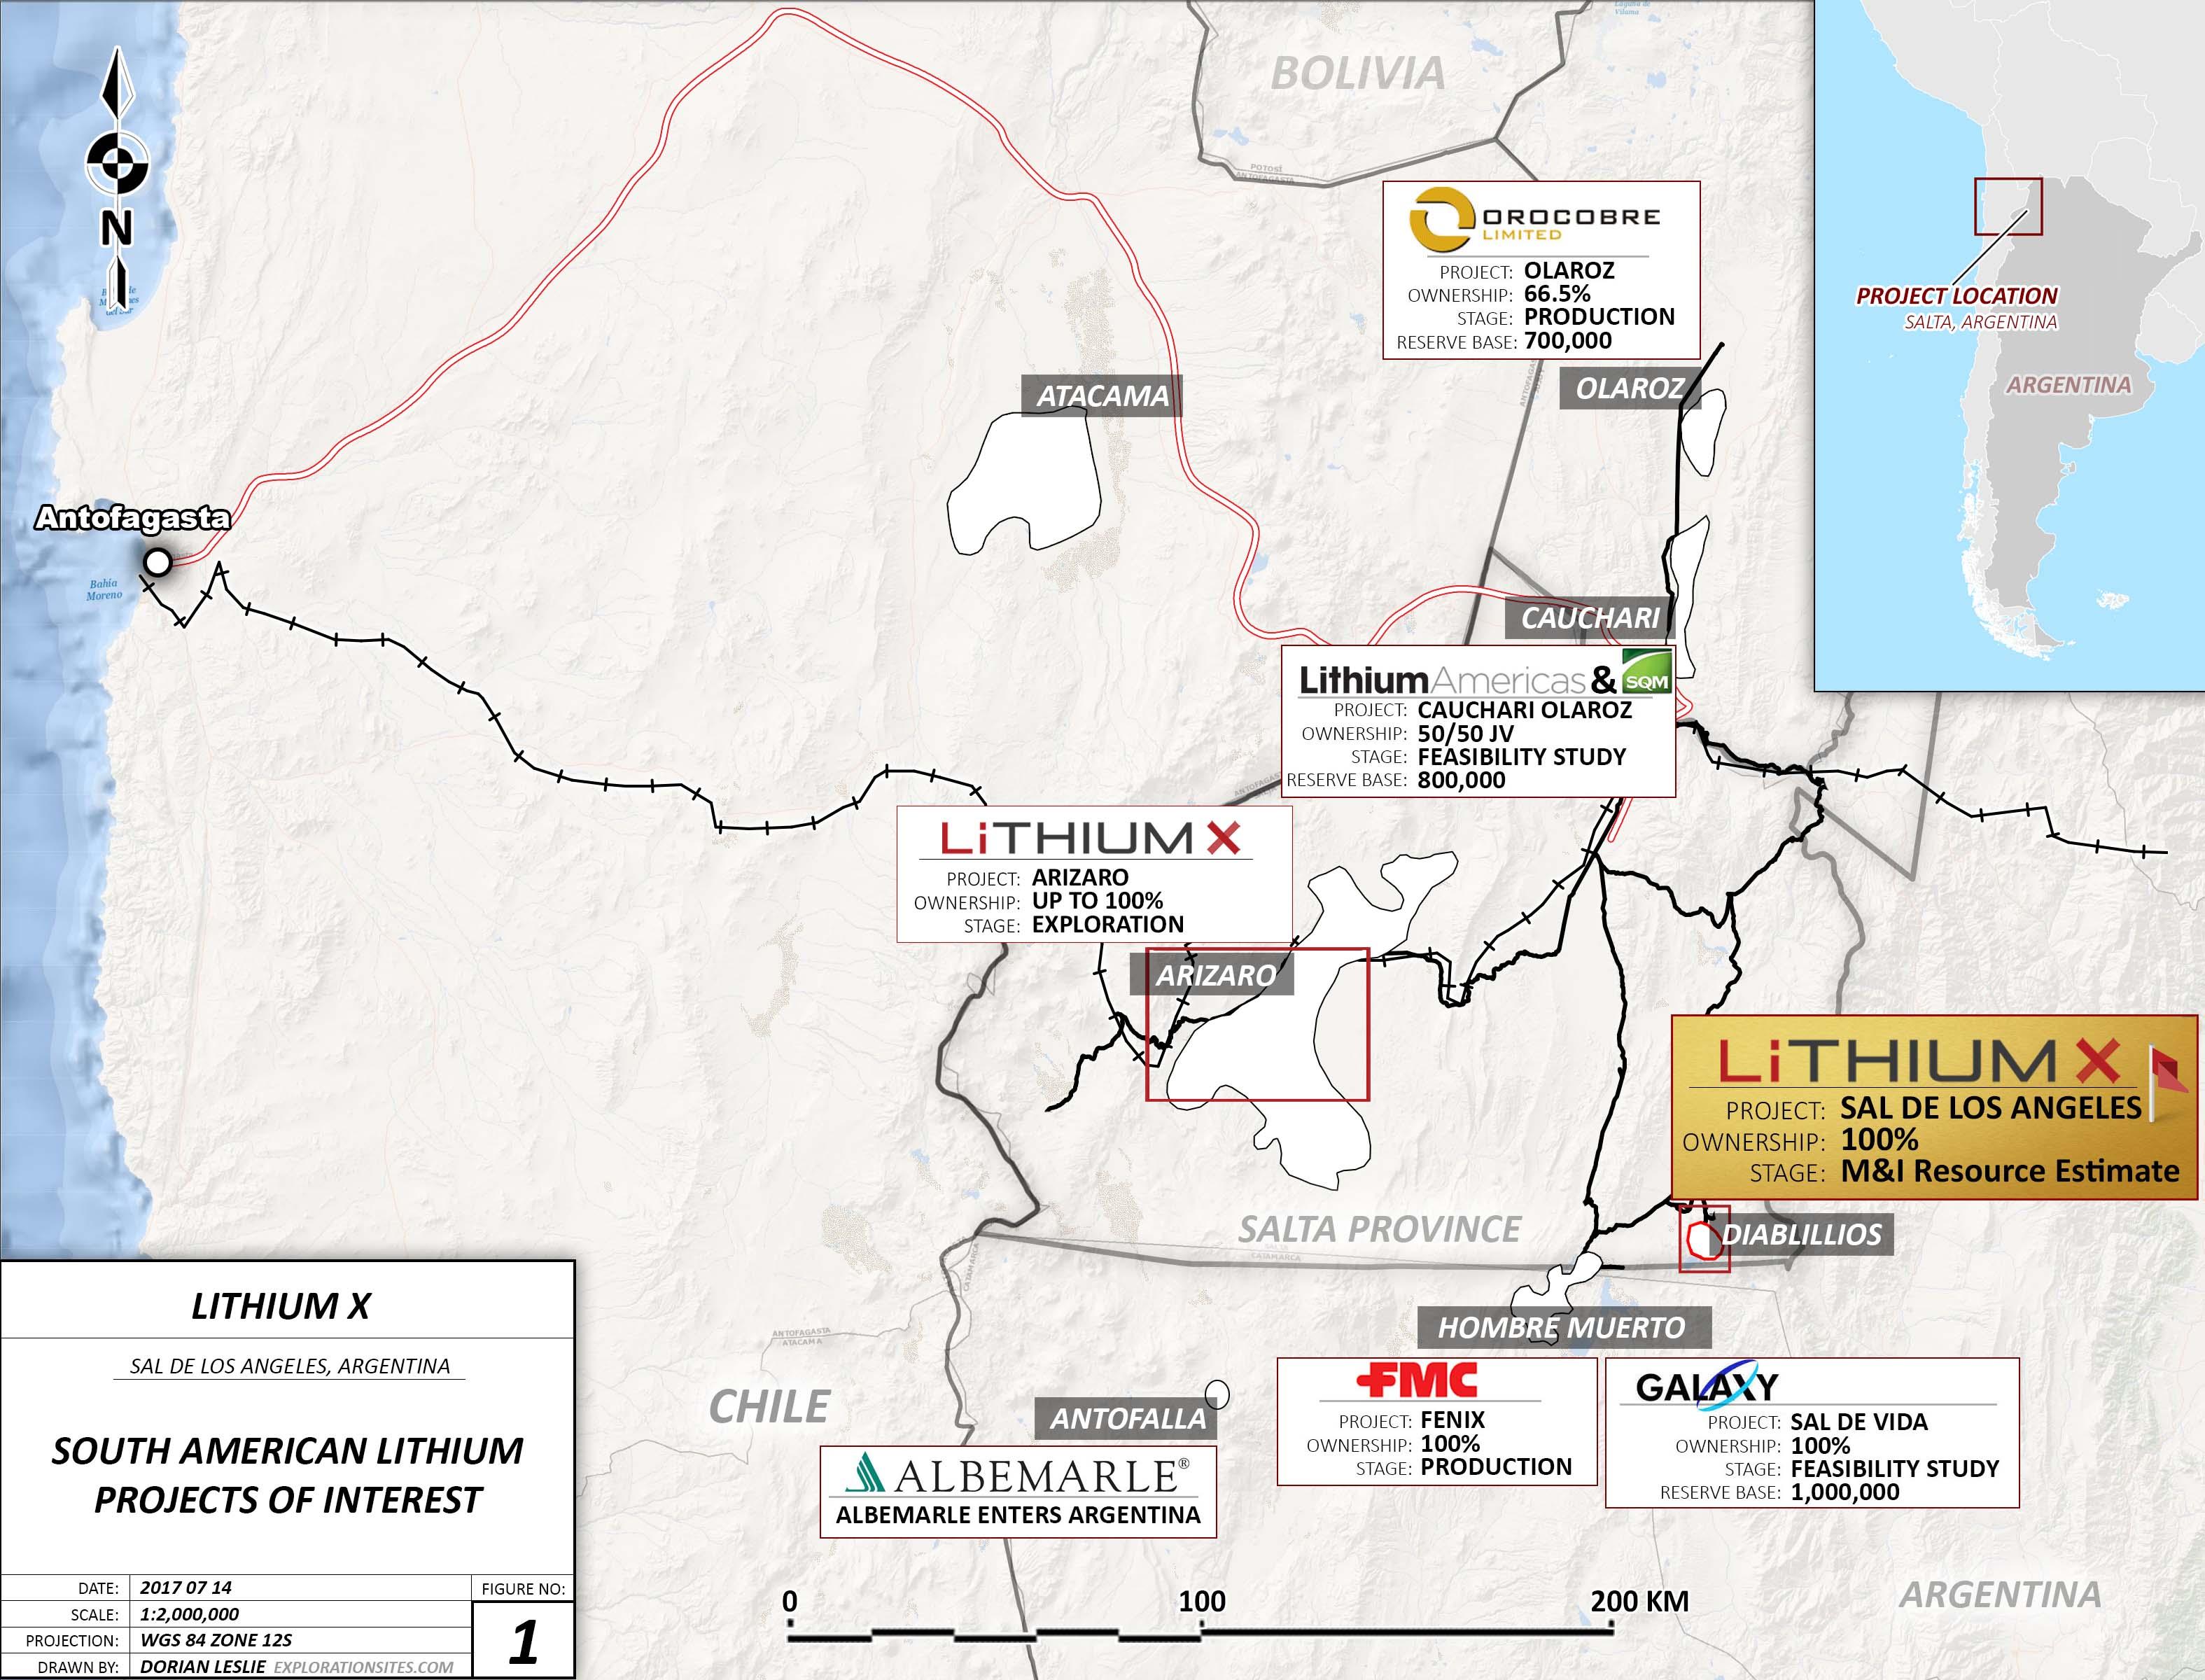 LIX_southAmerica_Project18